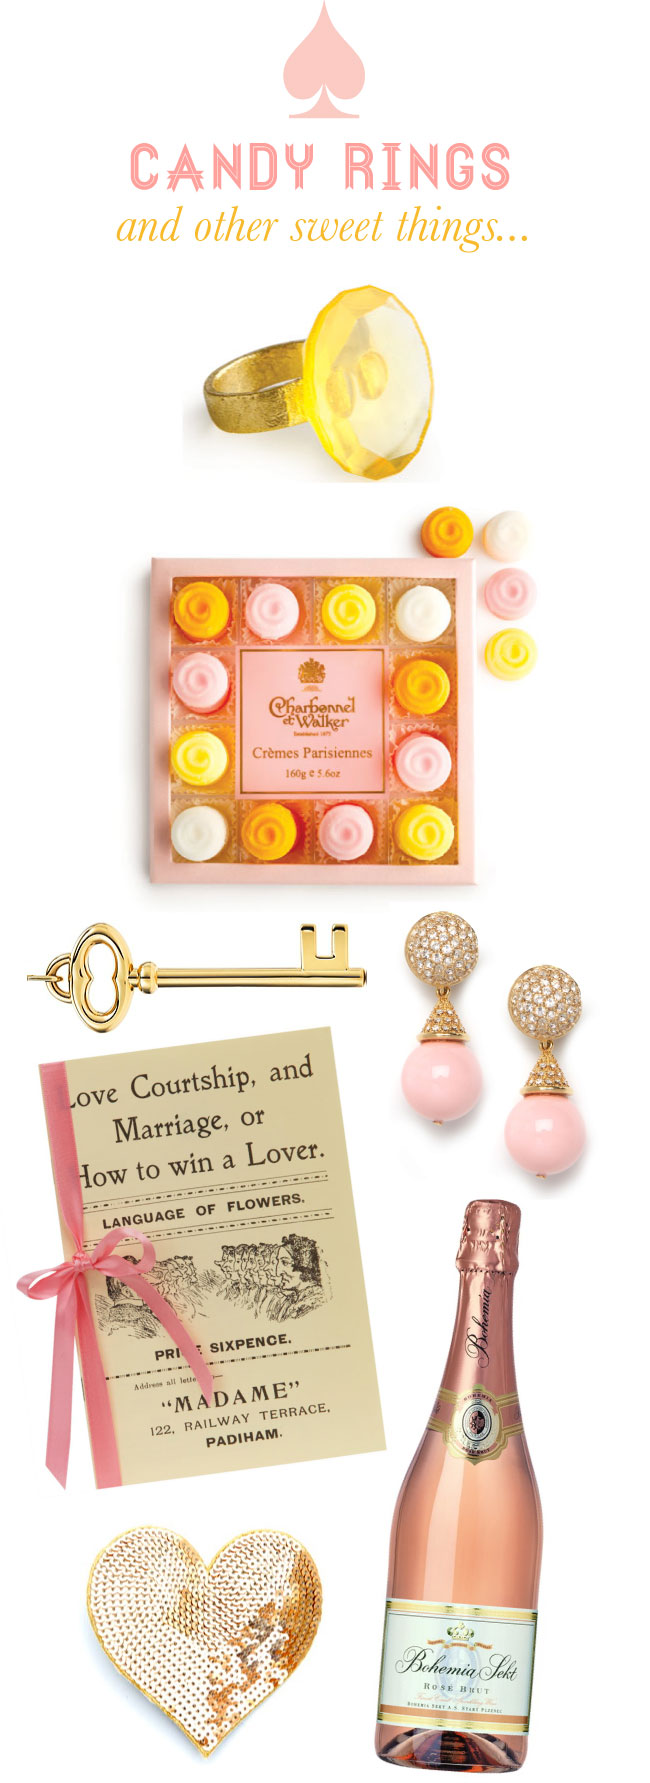 candy-rings.jpg